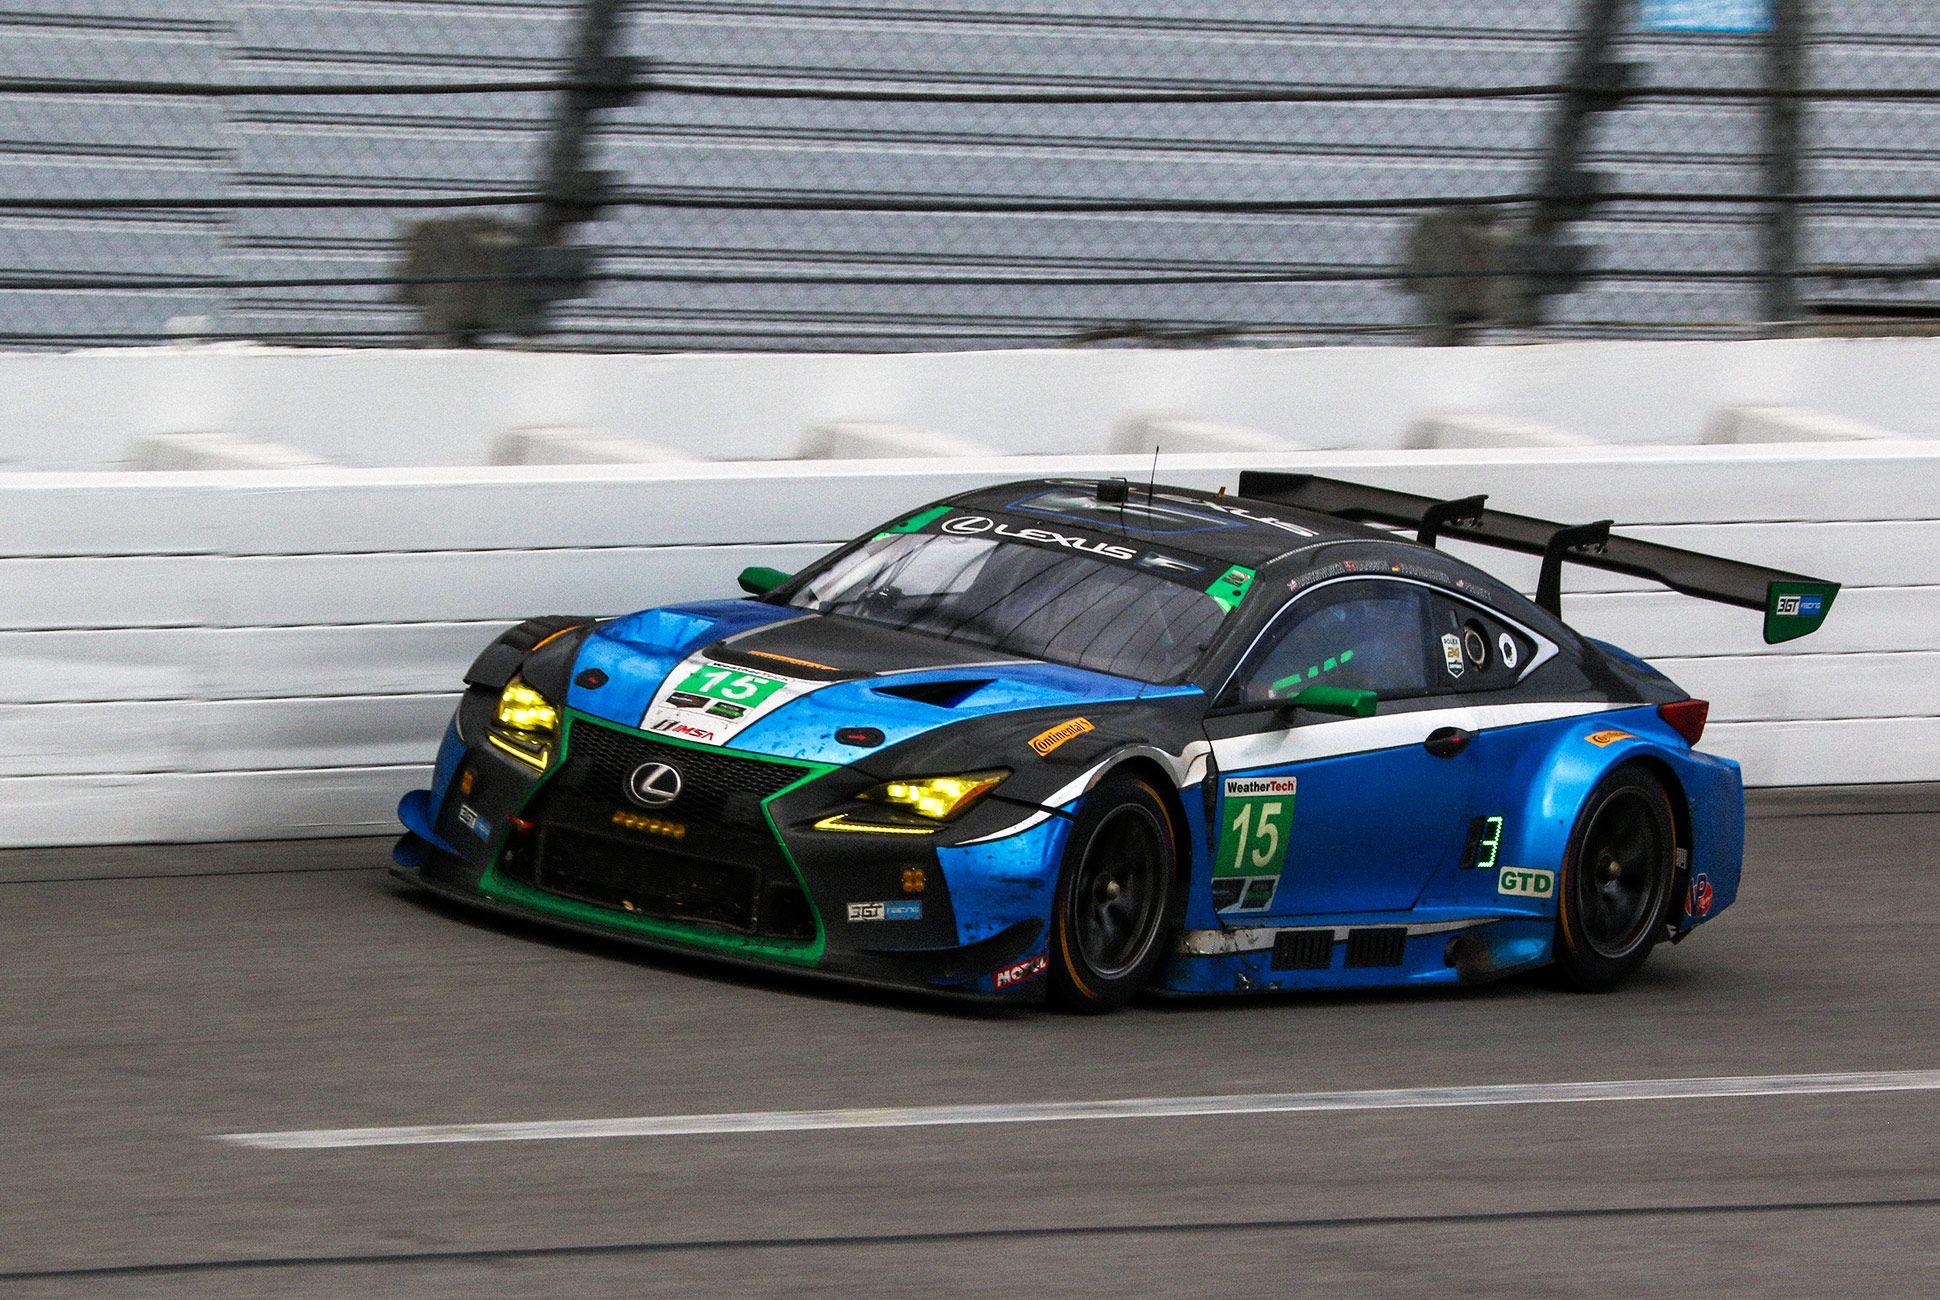 Best-Sports-Cars-of-2018-Daytona-24-Hours-gear-patrol-Lexus-RC-F-GT3-2